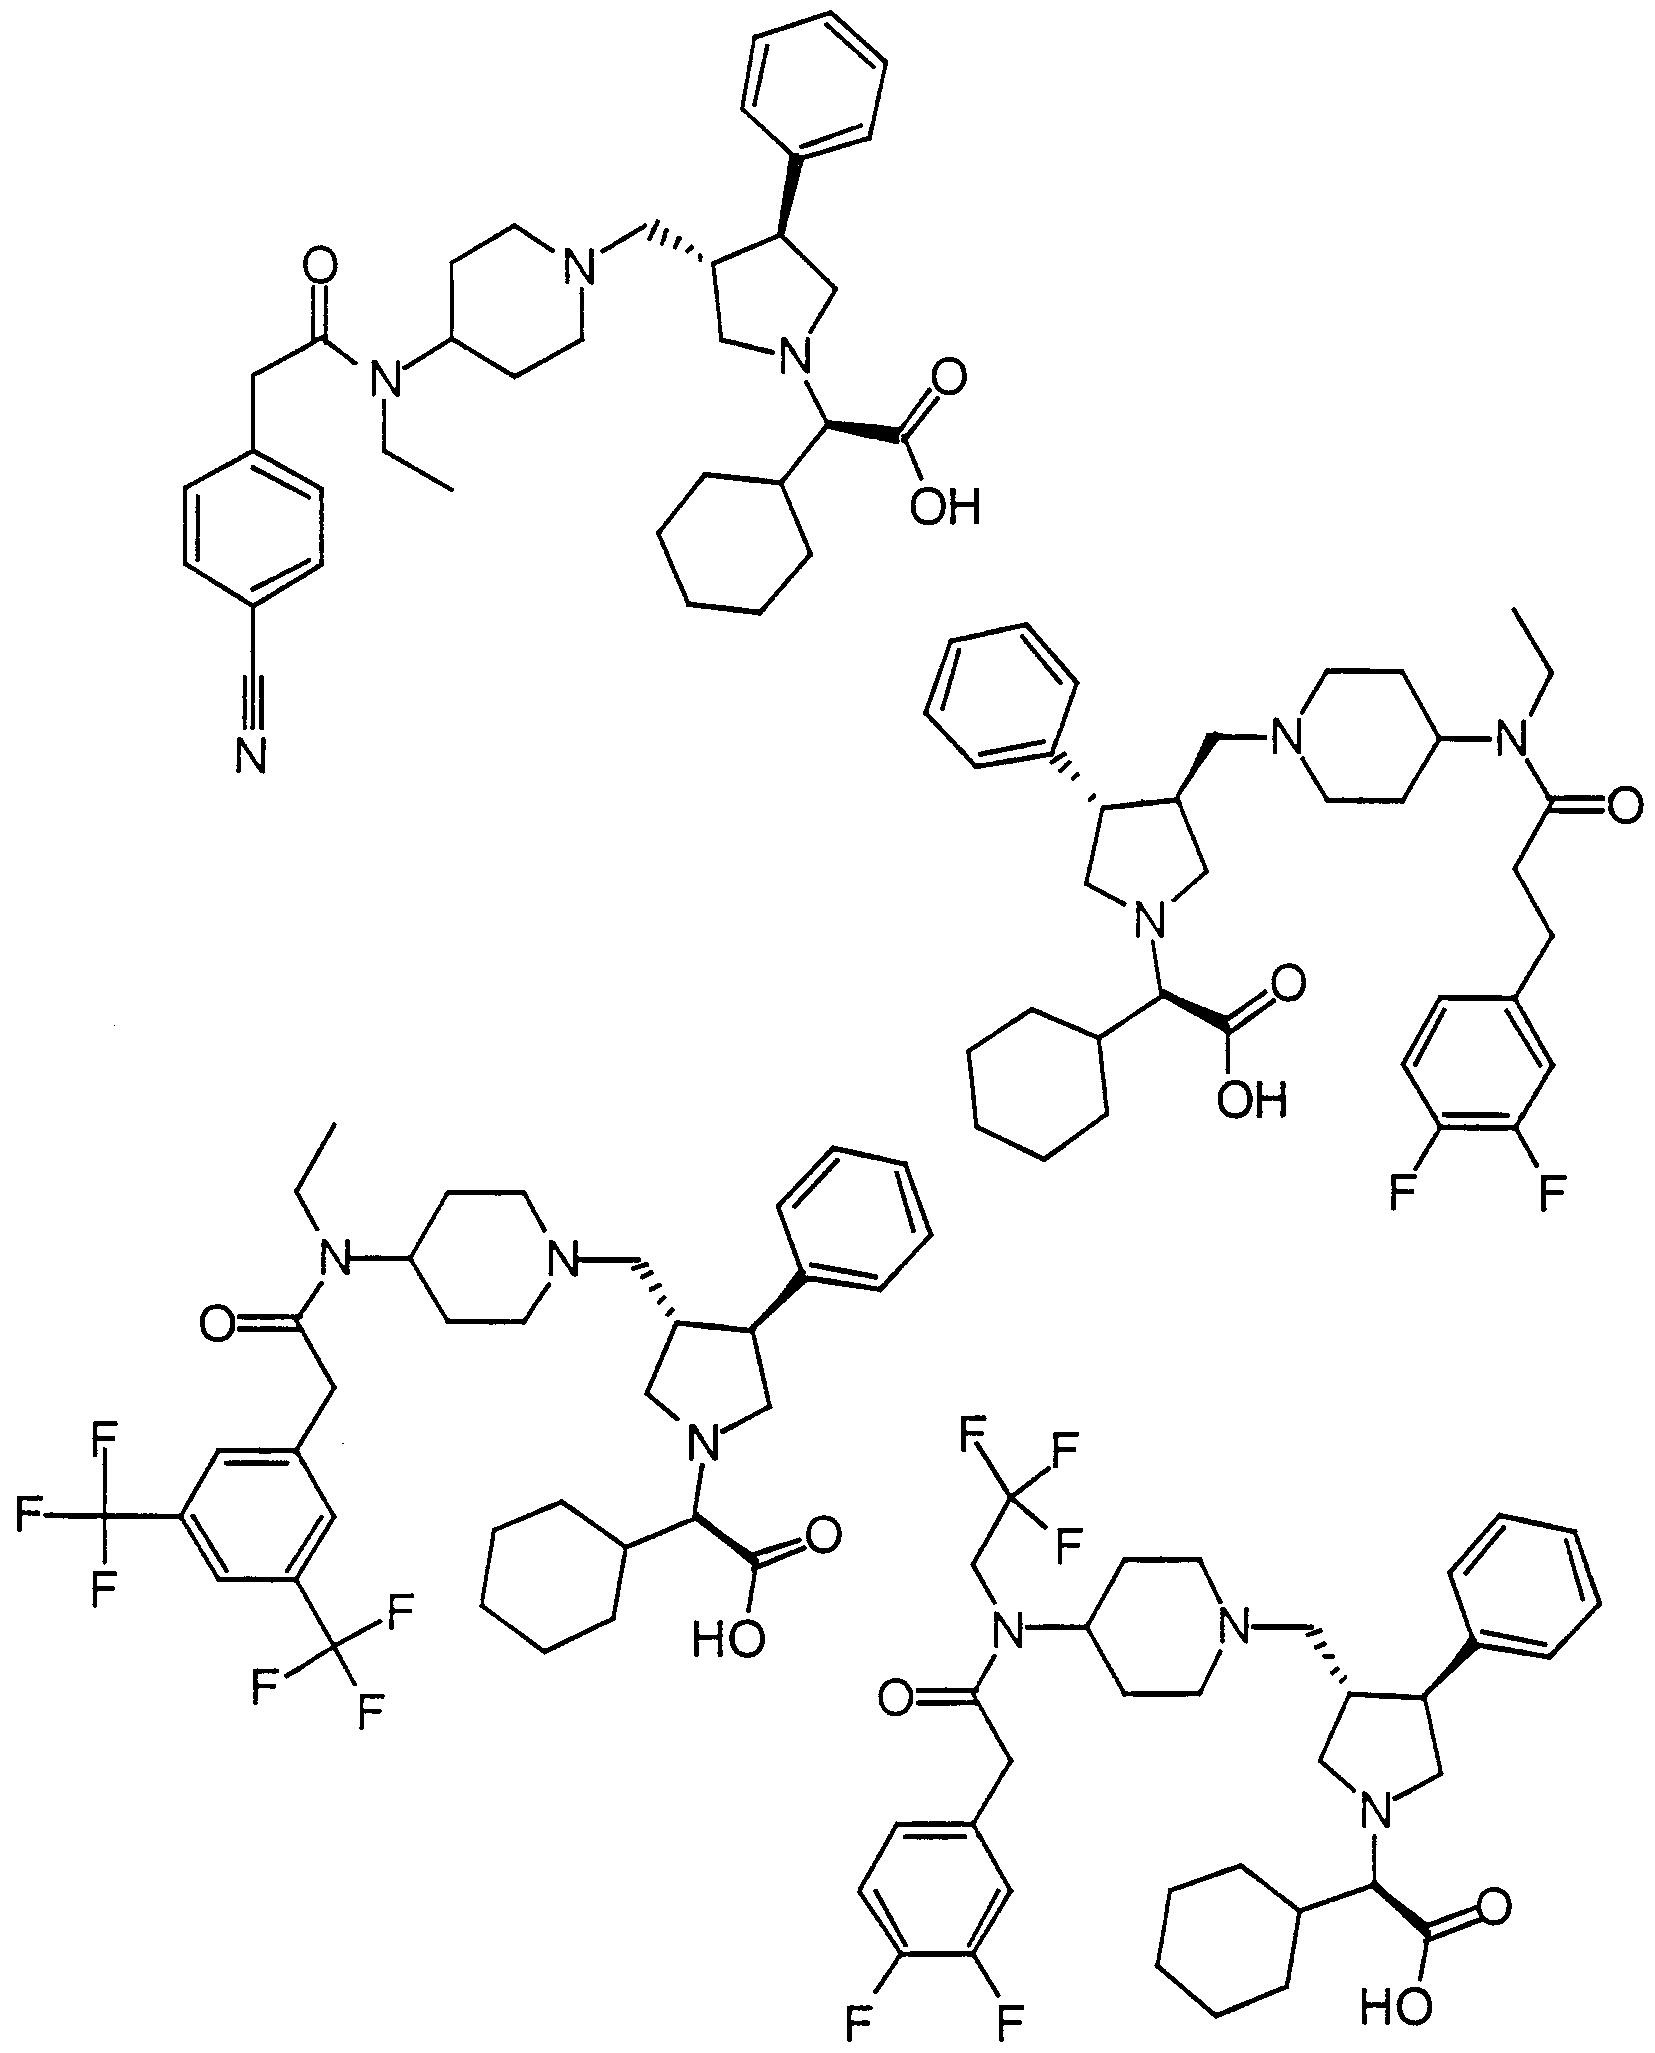 wo2000059497a1 pyrrolidine modulators of chemokine receptor Electrical Product Items figure imgf000046 0001